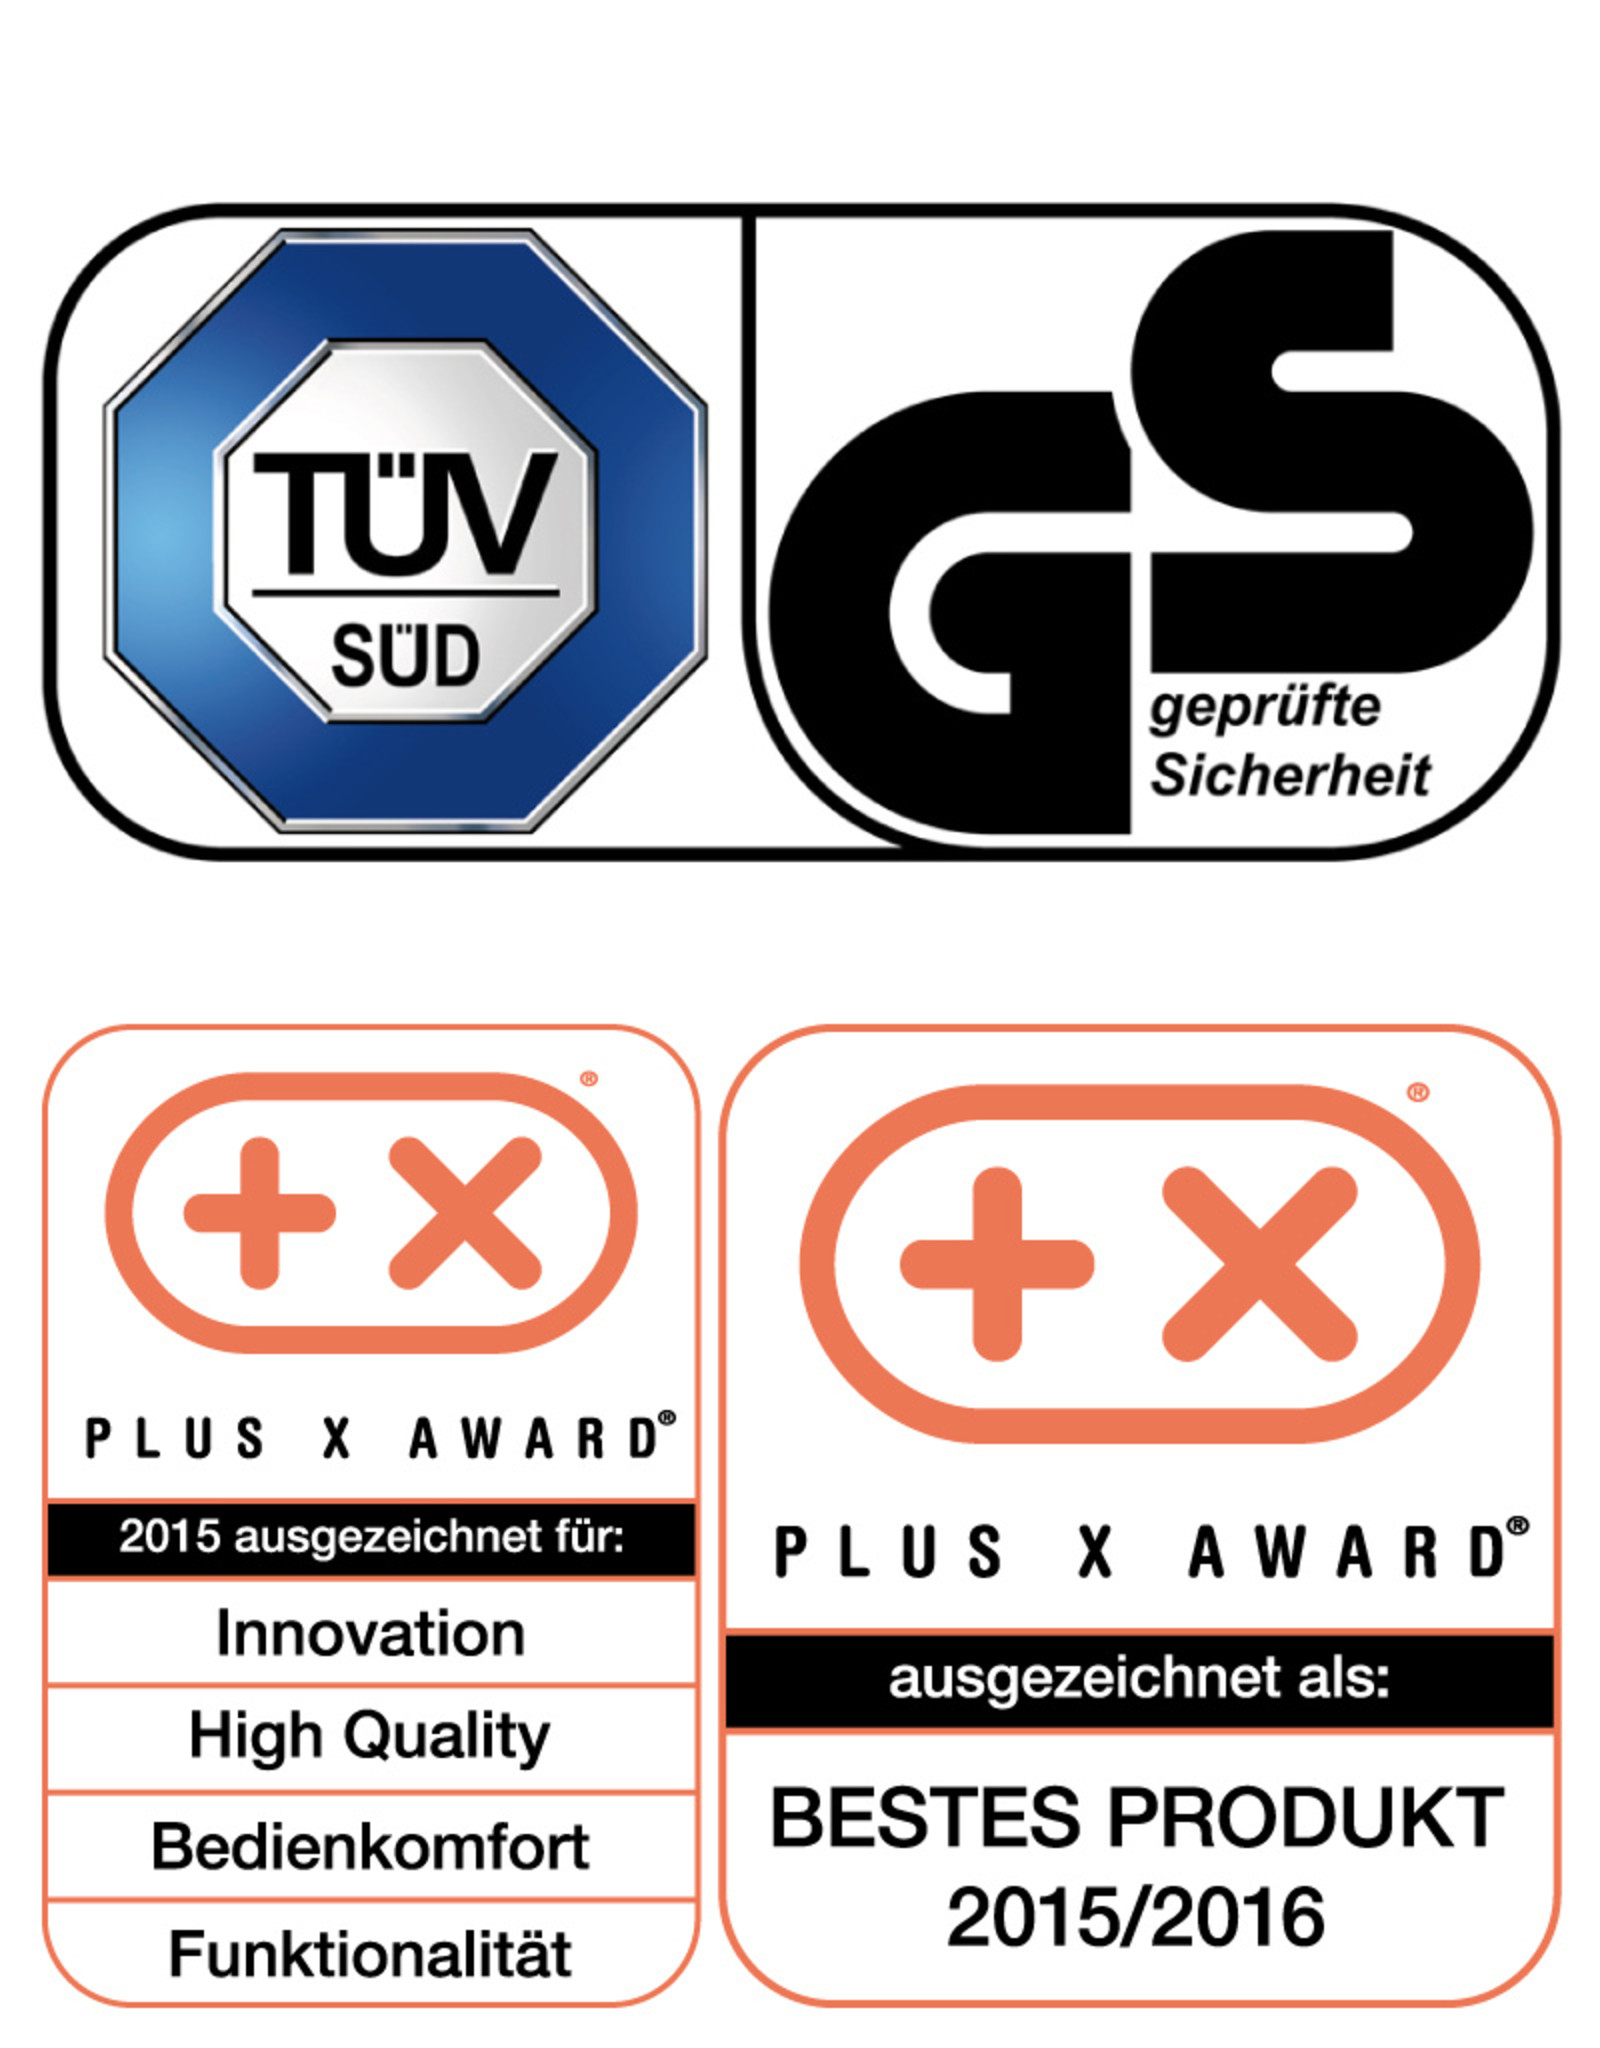 INVITALIS UK Vitalymed Flexi - Schwarz mit UK Adapter